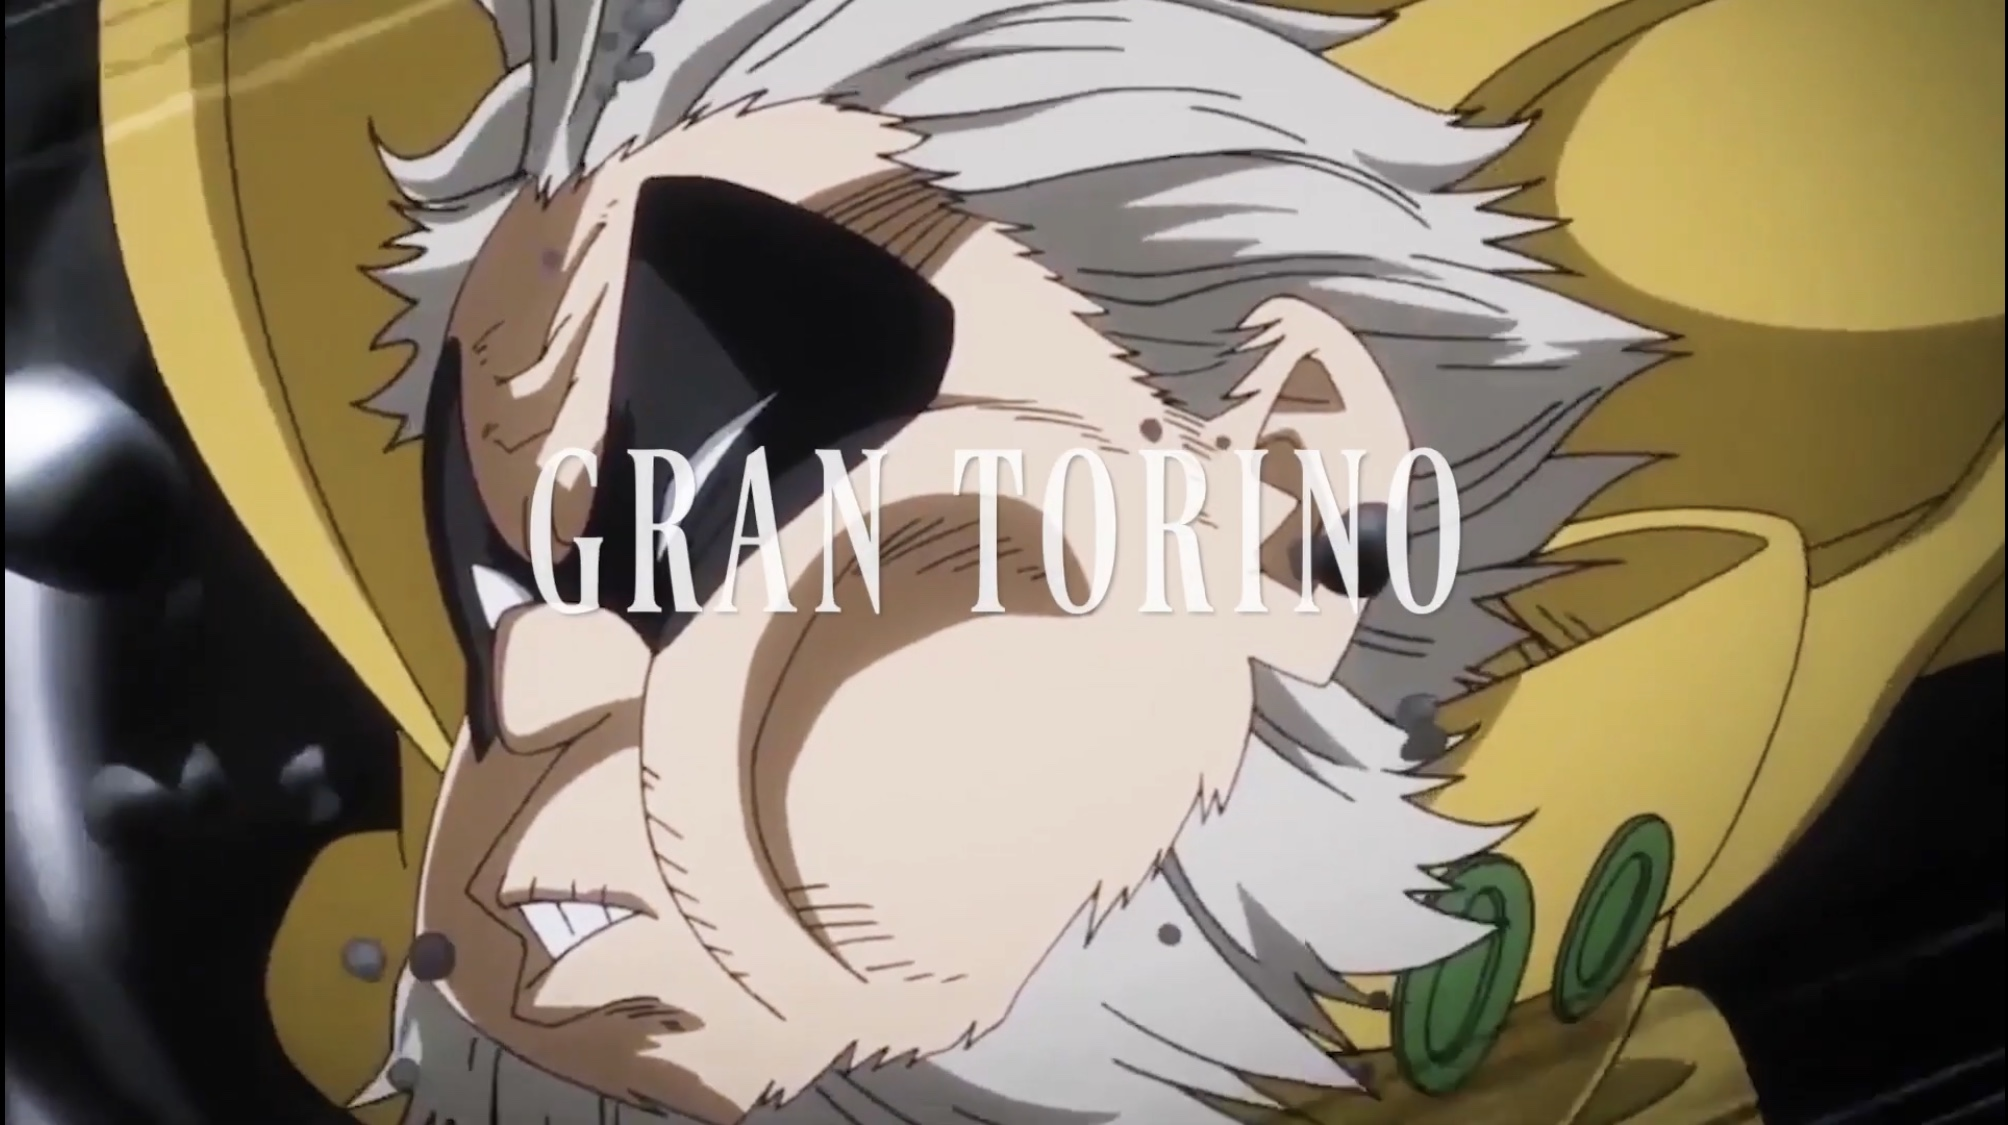 Mega Ran x Jalopy Bungus - GRANTORINO | Video